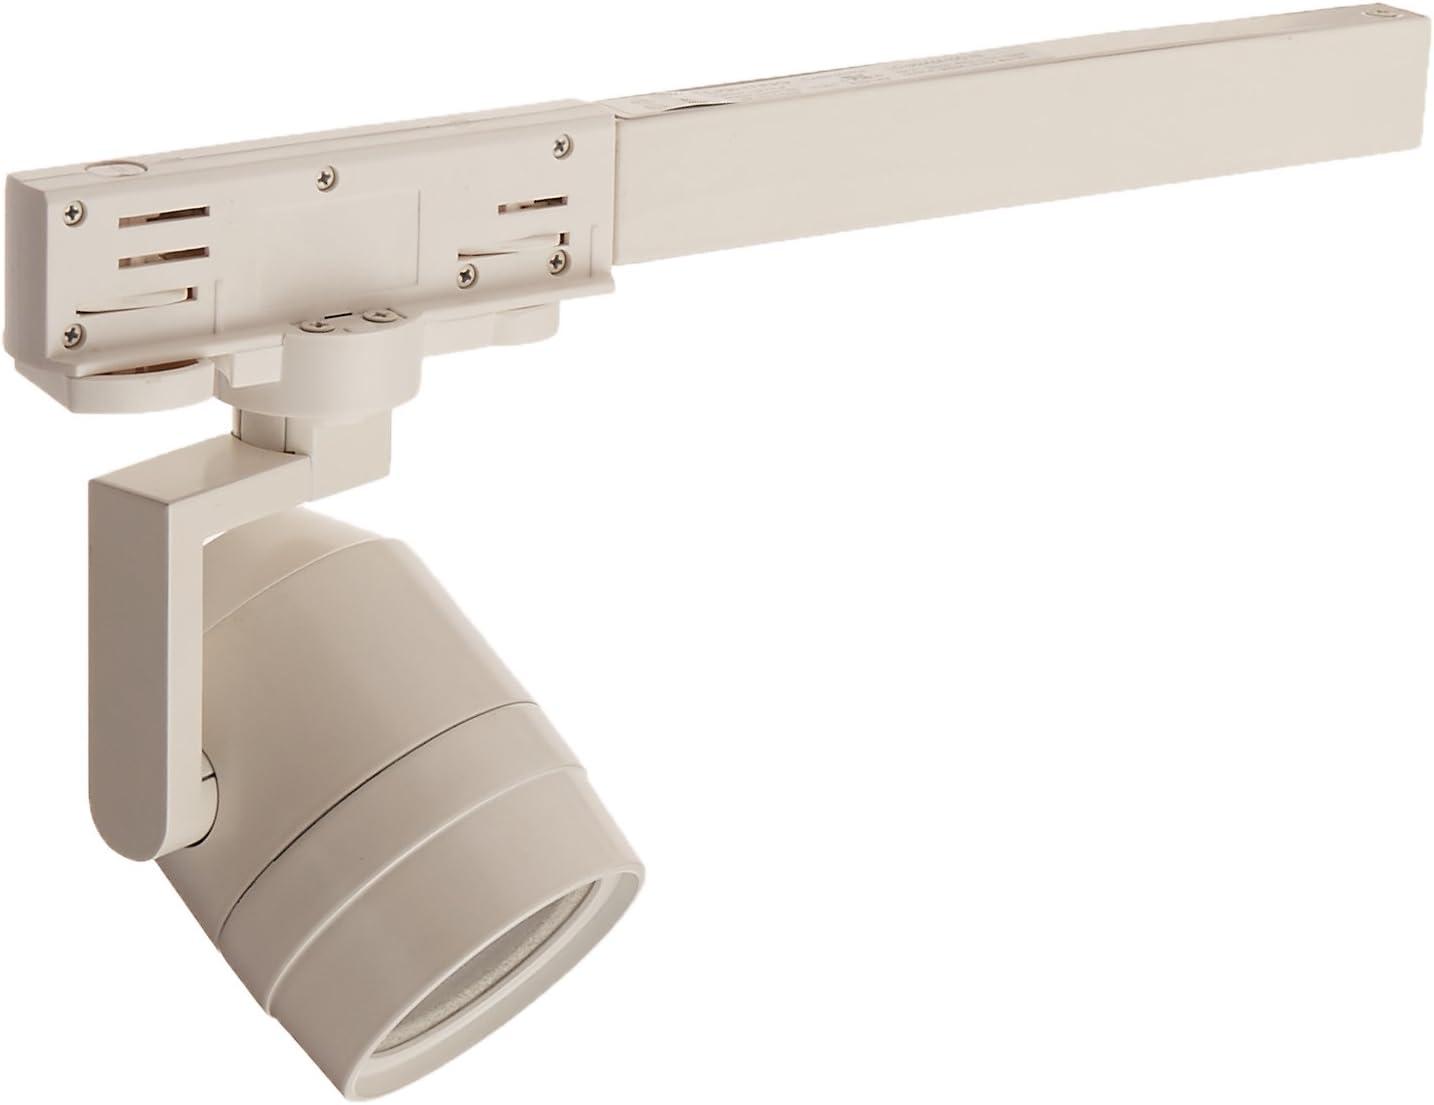 WAC Lighting WHK-LED522F-27-WT 23W LED Paloma Track Head for 277V W Track Flood 2700K